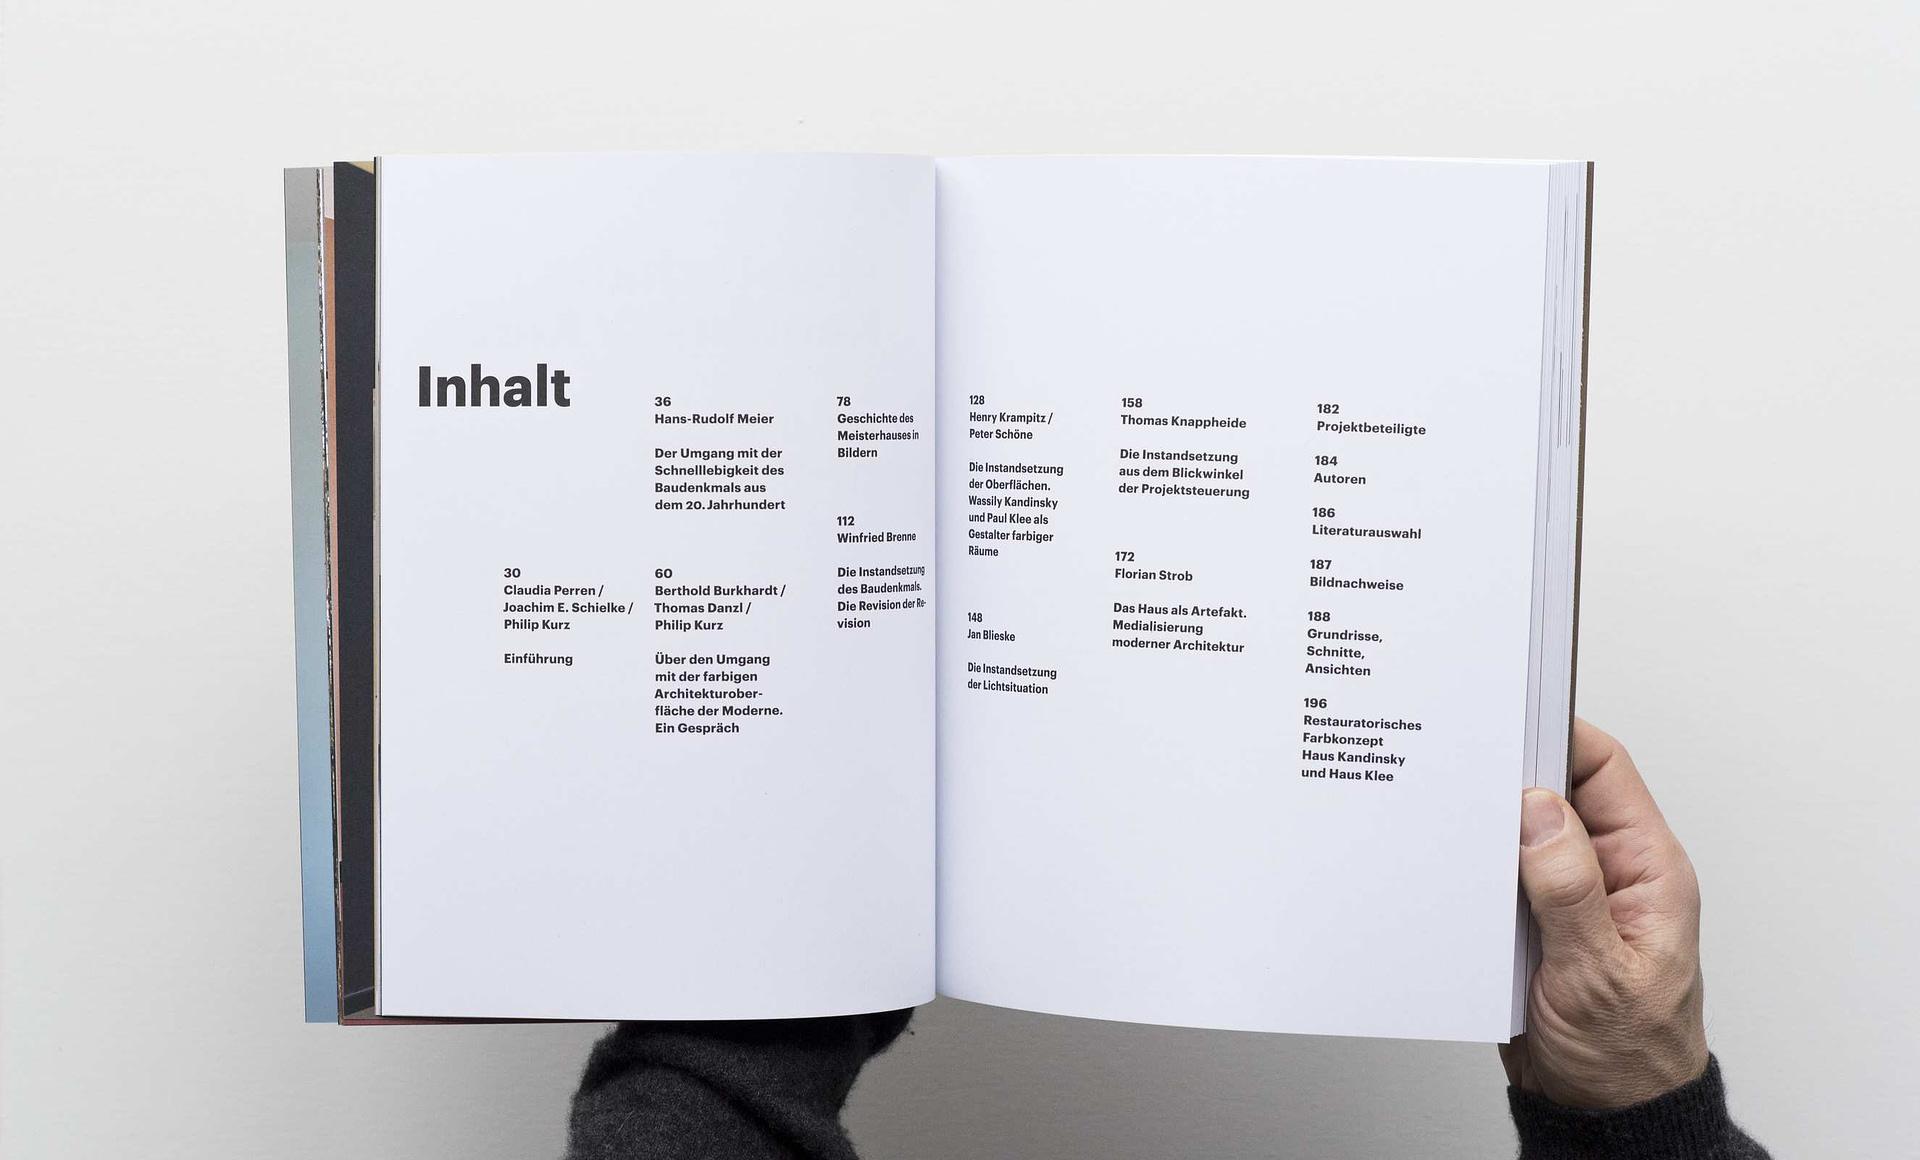 meisterhaus-kandinsky-klee-book-5-2650x1600px